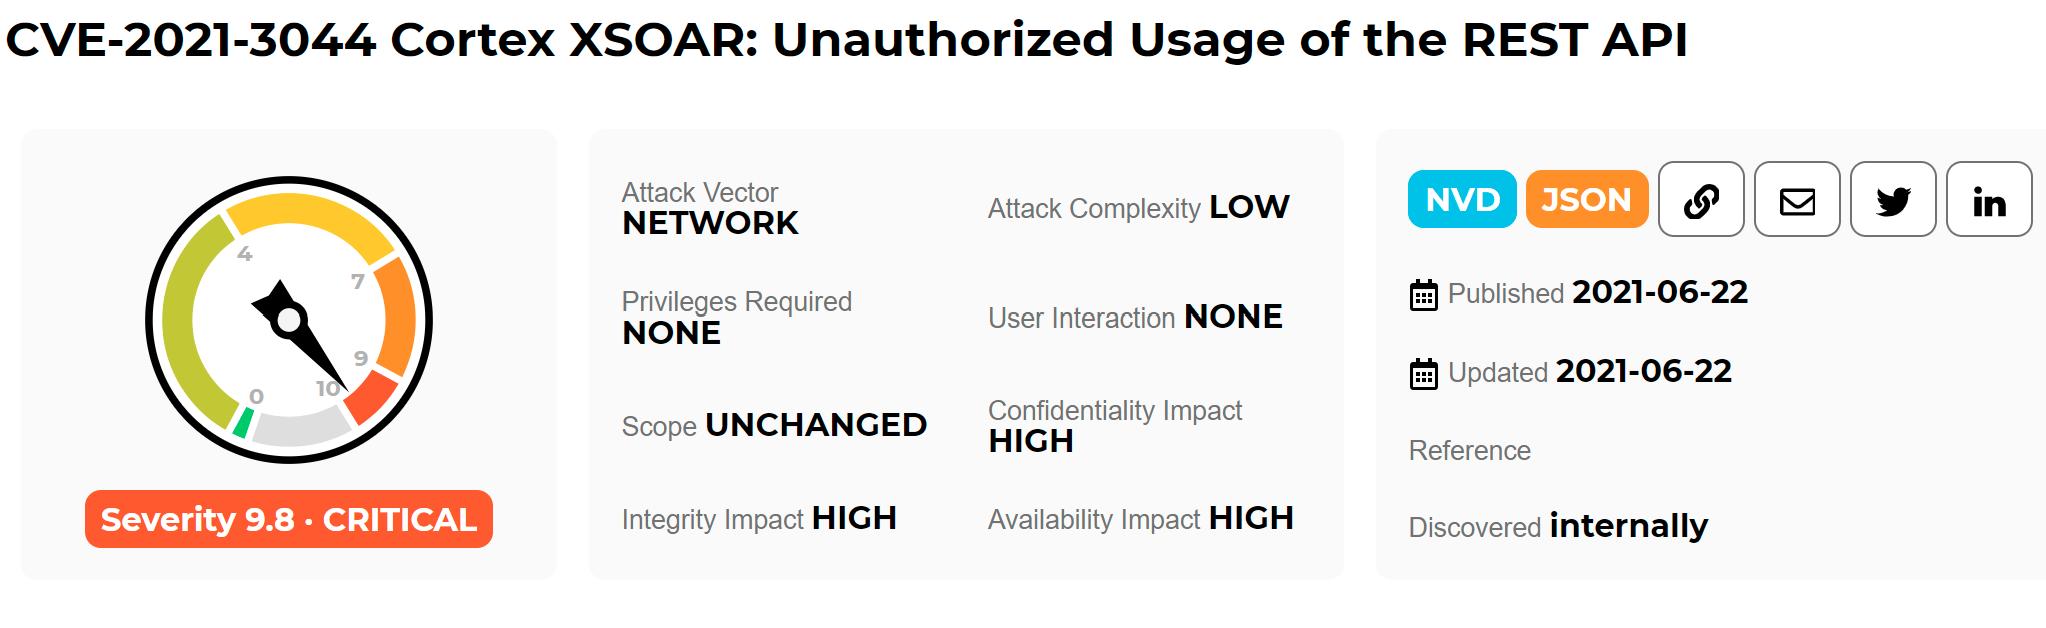 CVE-2021-3044: Palo Alto Networks Cortex XSOAR improper authorization vulnerability alert